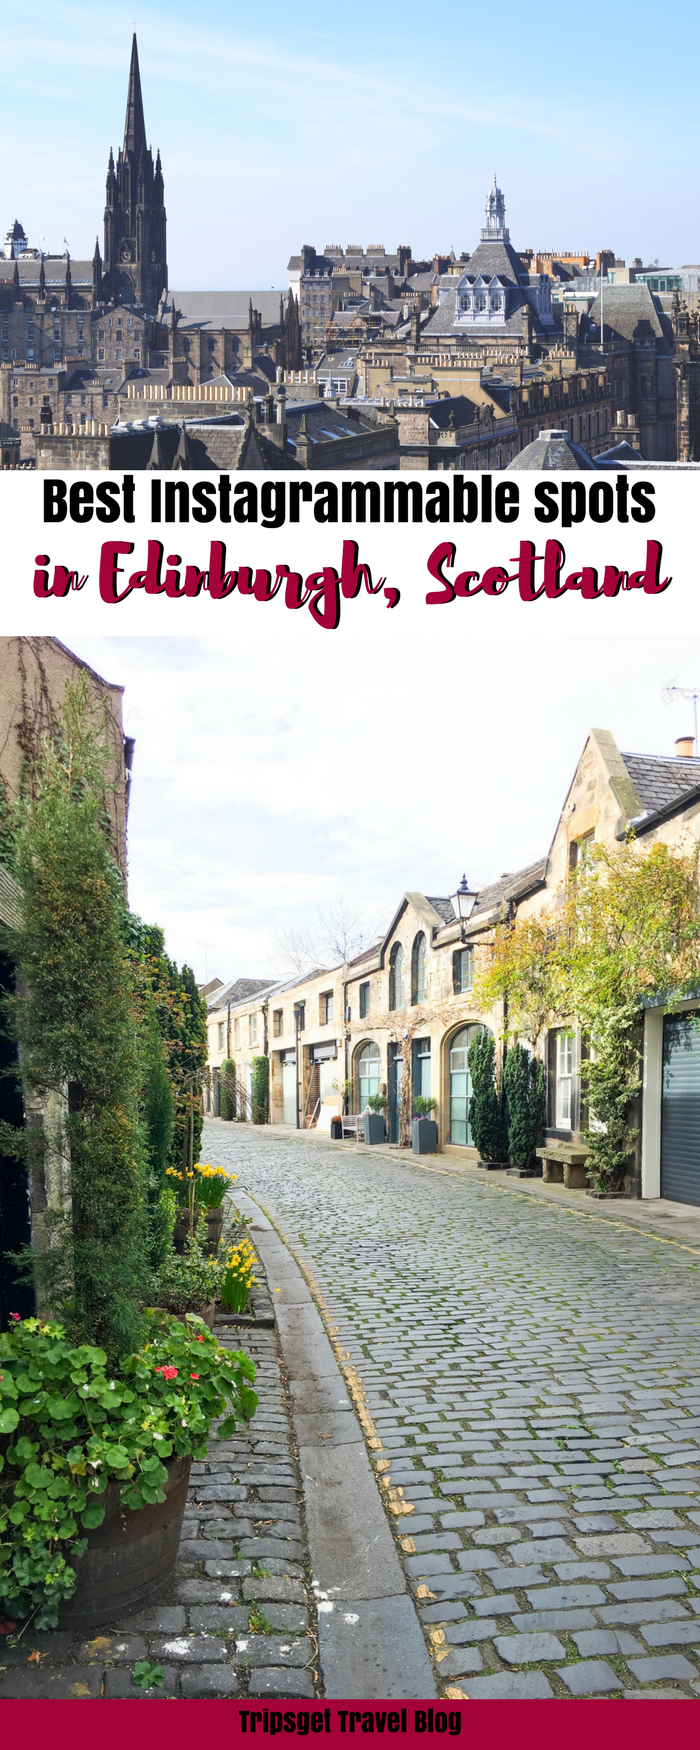 Edinburgh University FloWave | Edinburgh Designs | Random ...